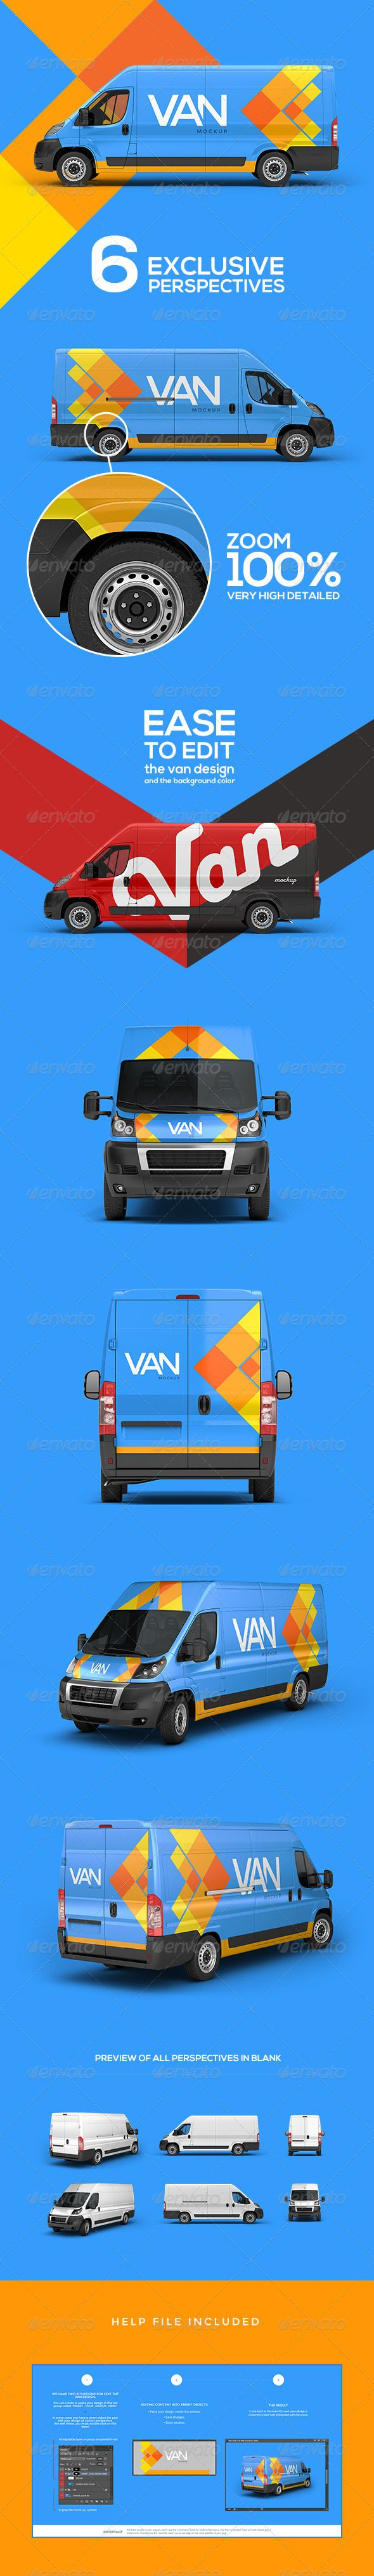 Van Mockup | #automockup #carmockup | Download: http://graphicriver.net/item/van-mockup/6992810?ref=ksioks